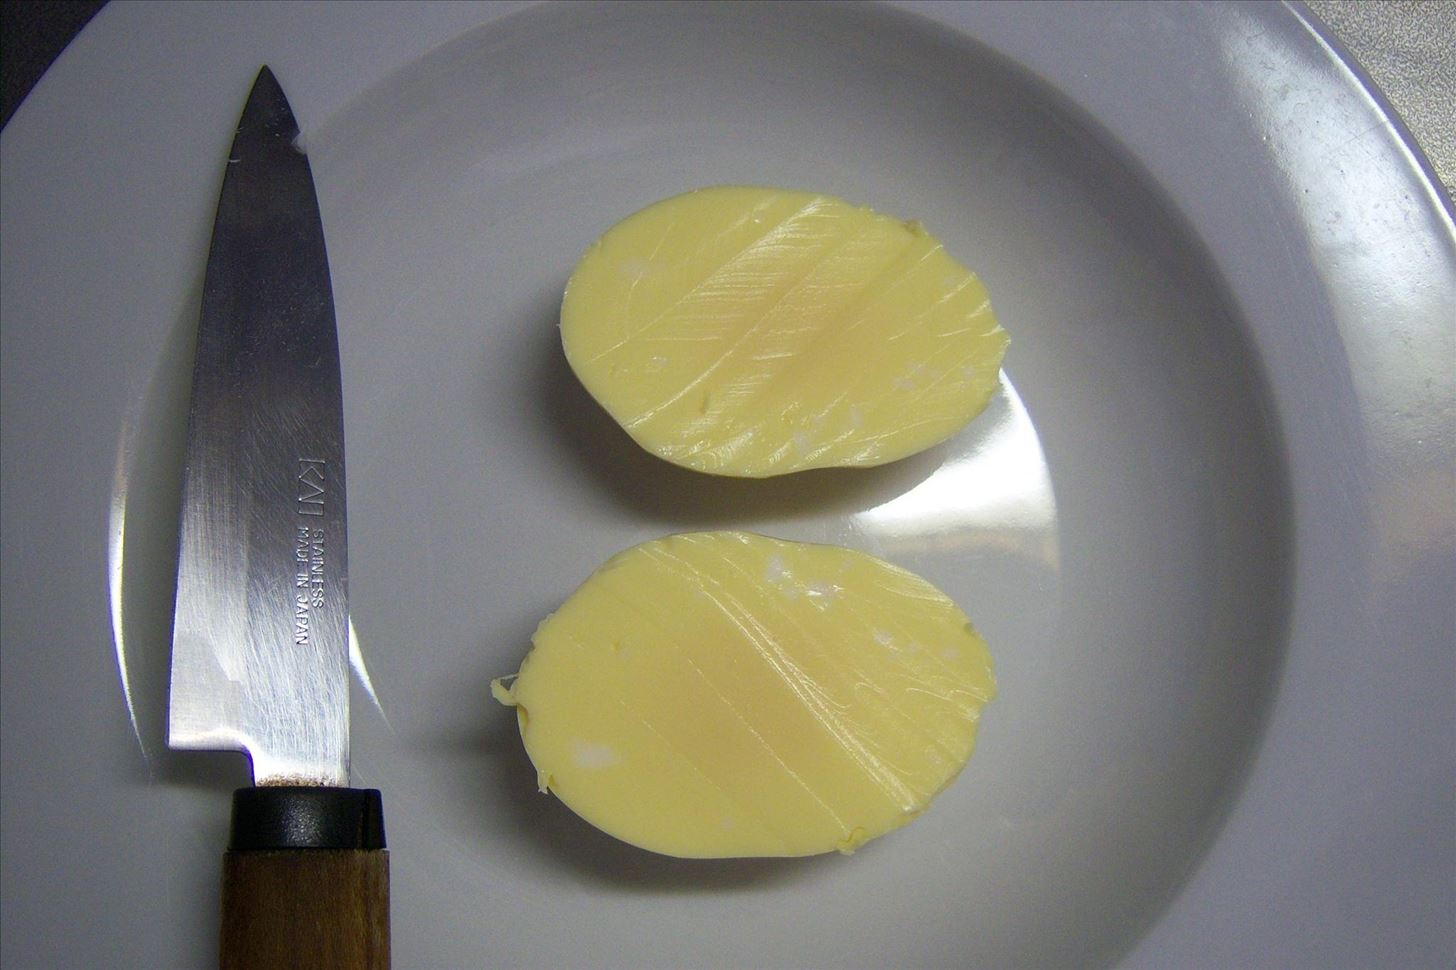 How a Breakfast Badass Makes EggsScrambled AND Hard-Boiled